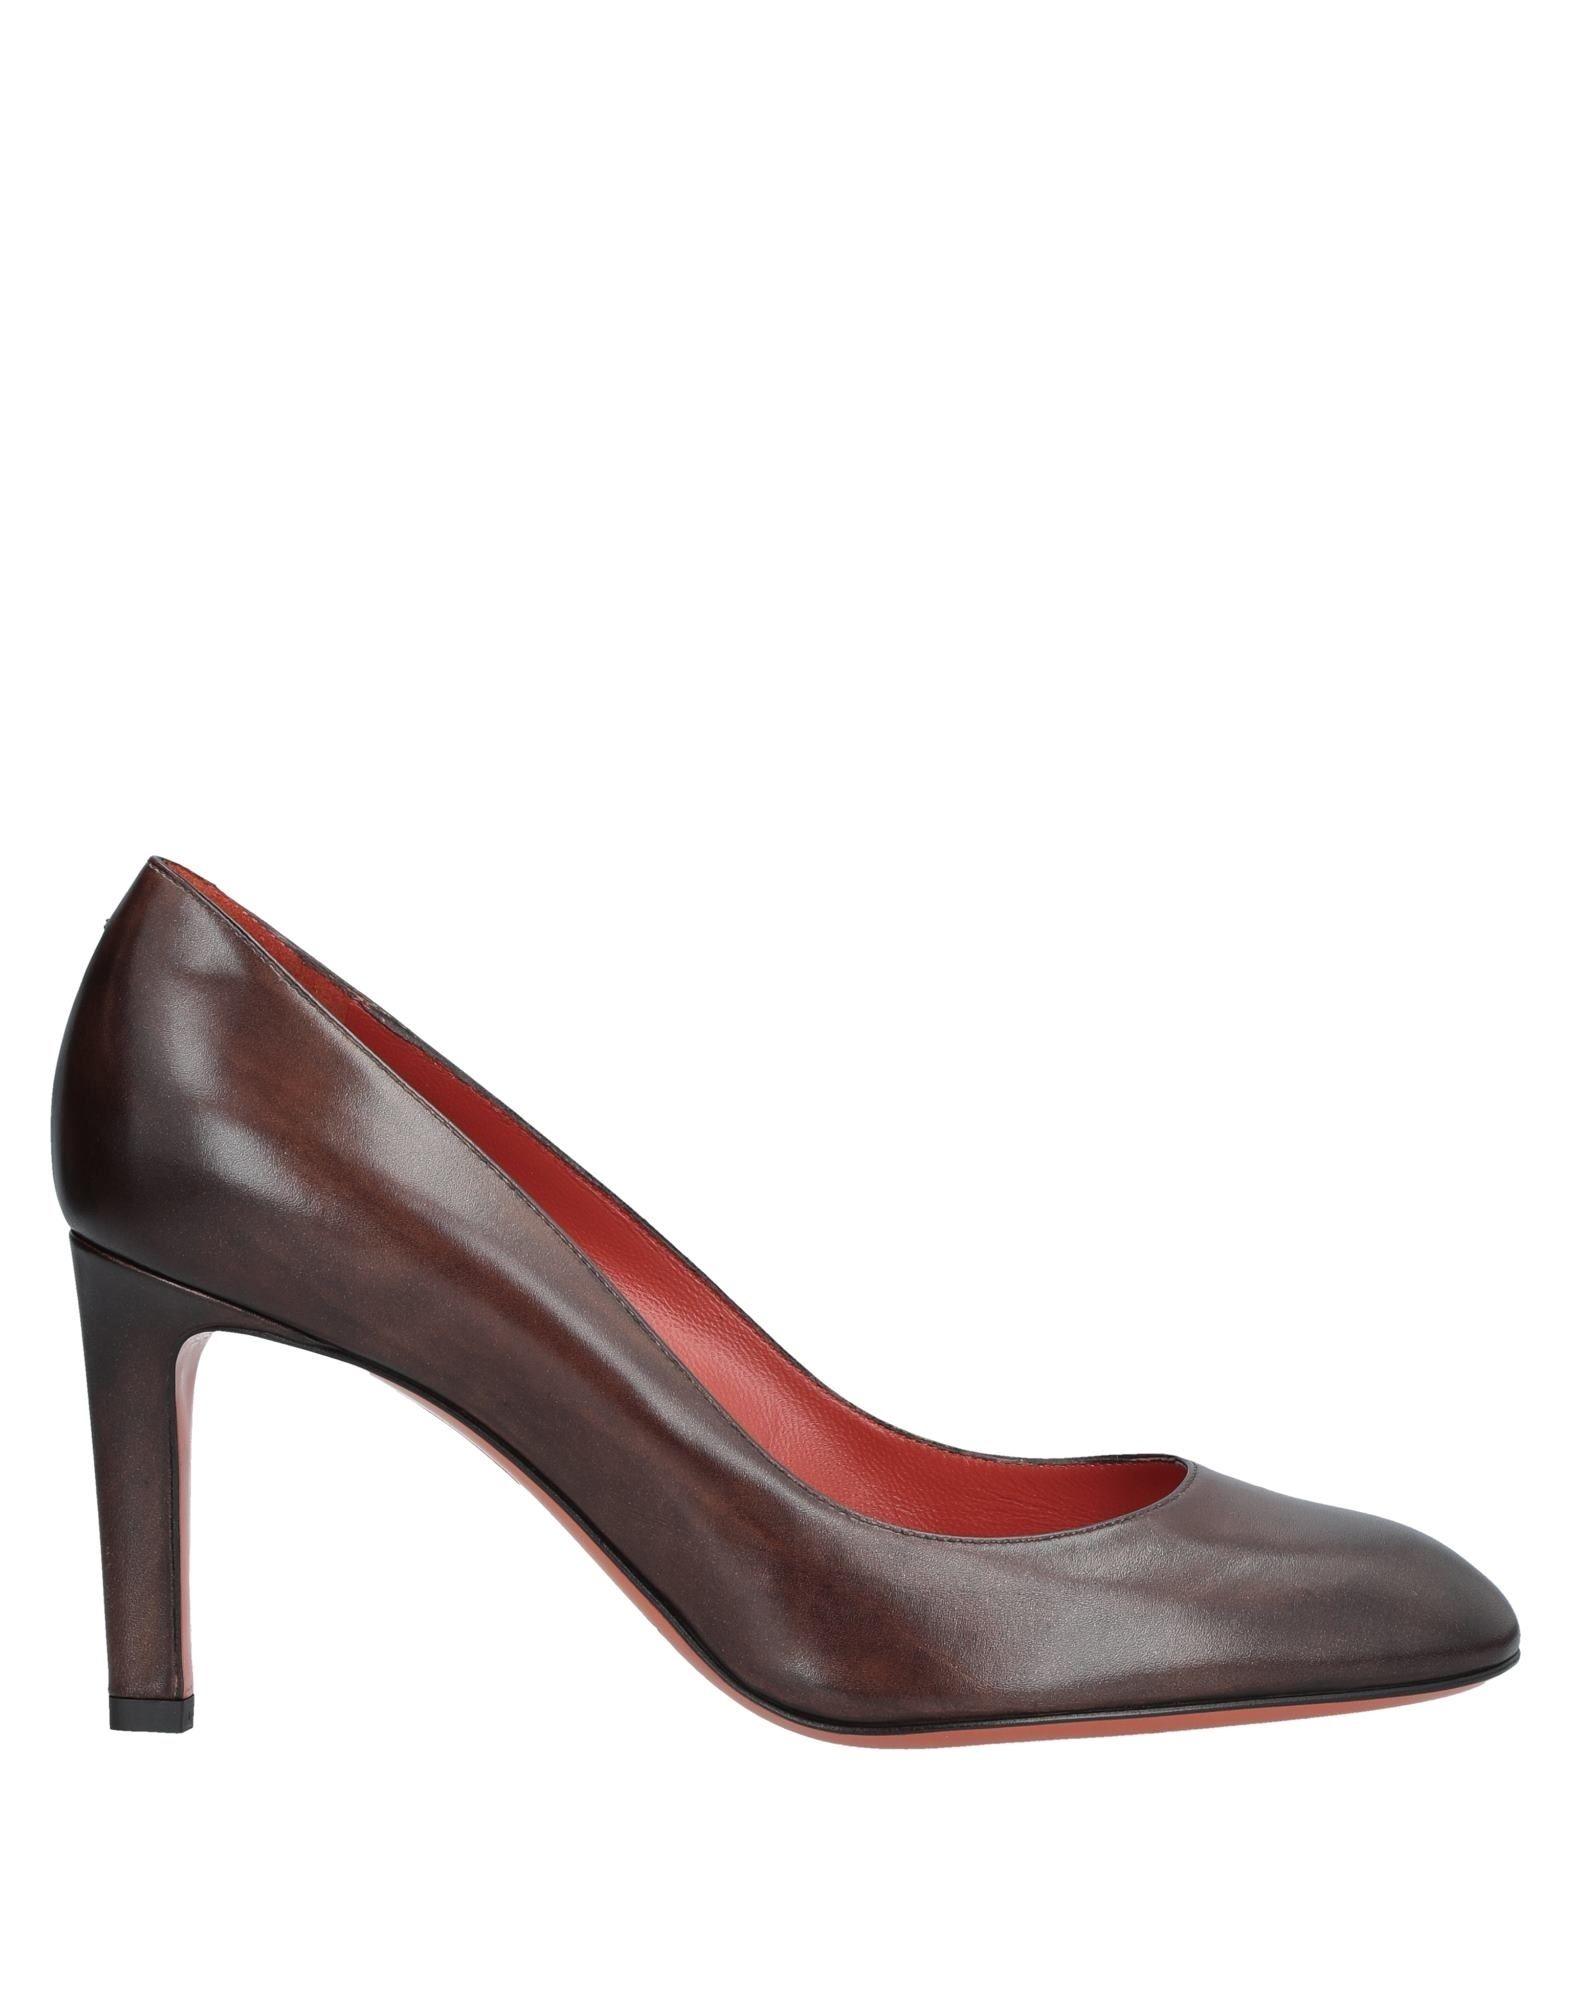 Haltbare Mode billige Schuhe Santoni Pumps Damen Damen Damen  11539171LL Heiße Schuhe cd8564